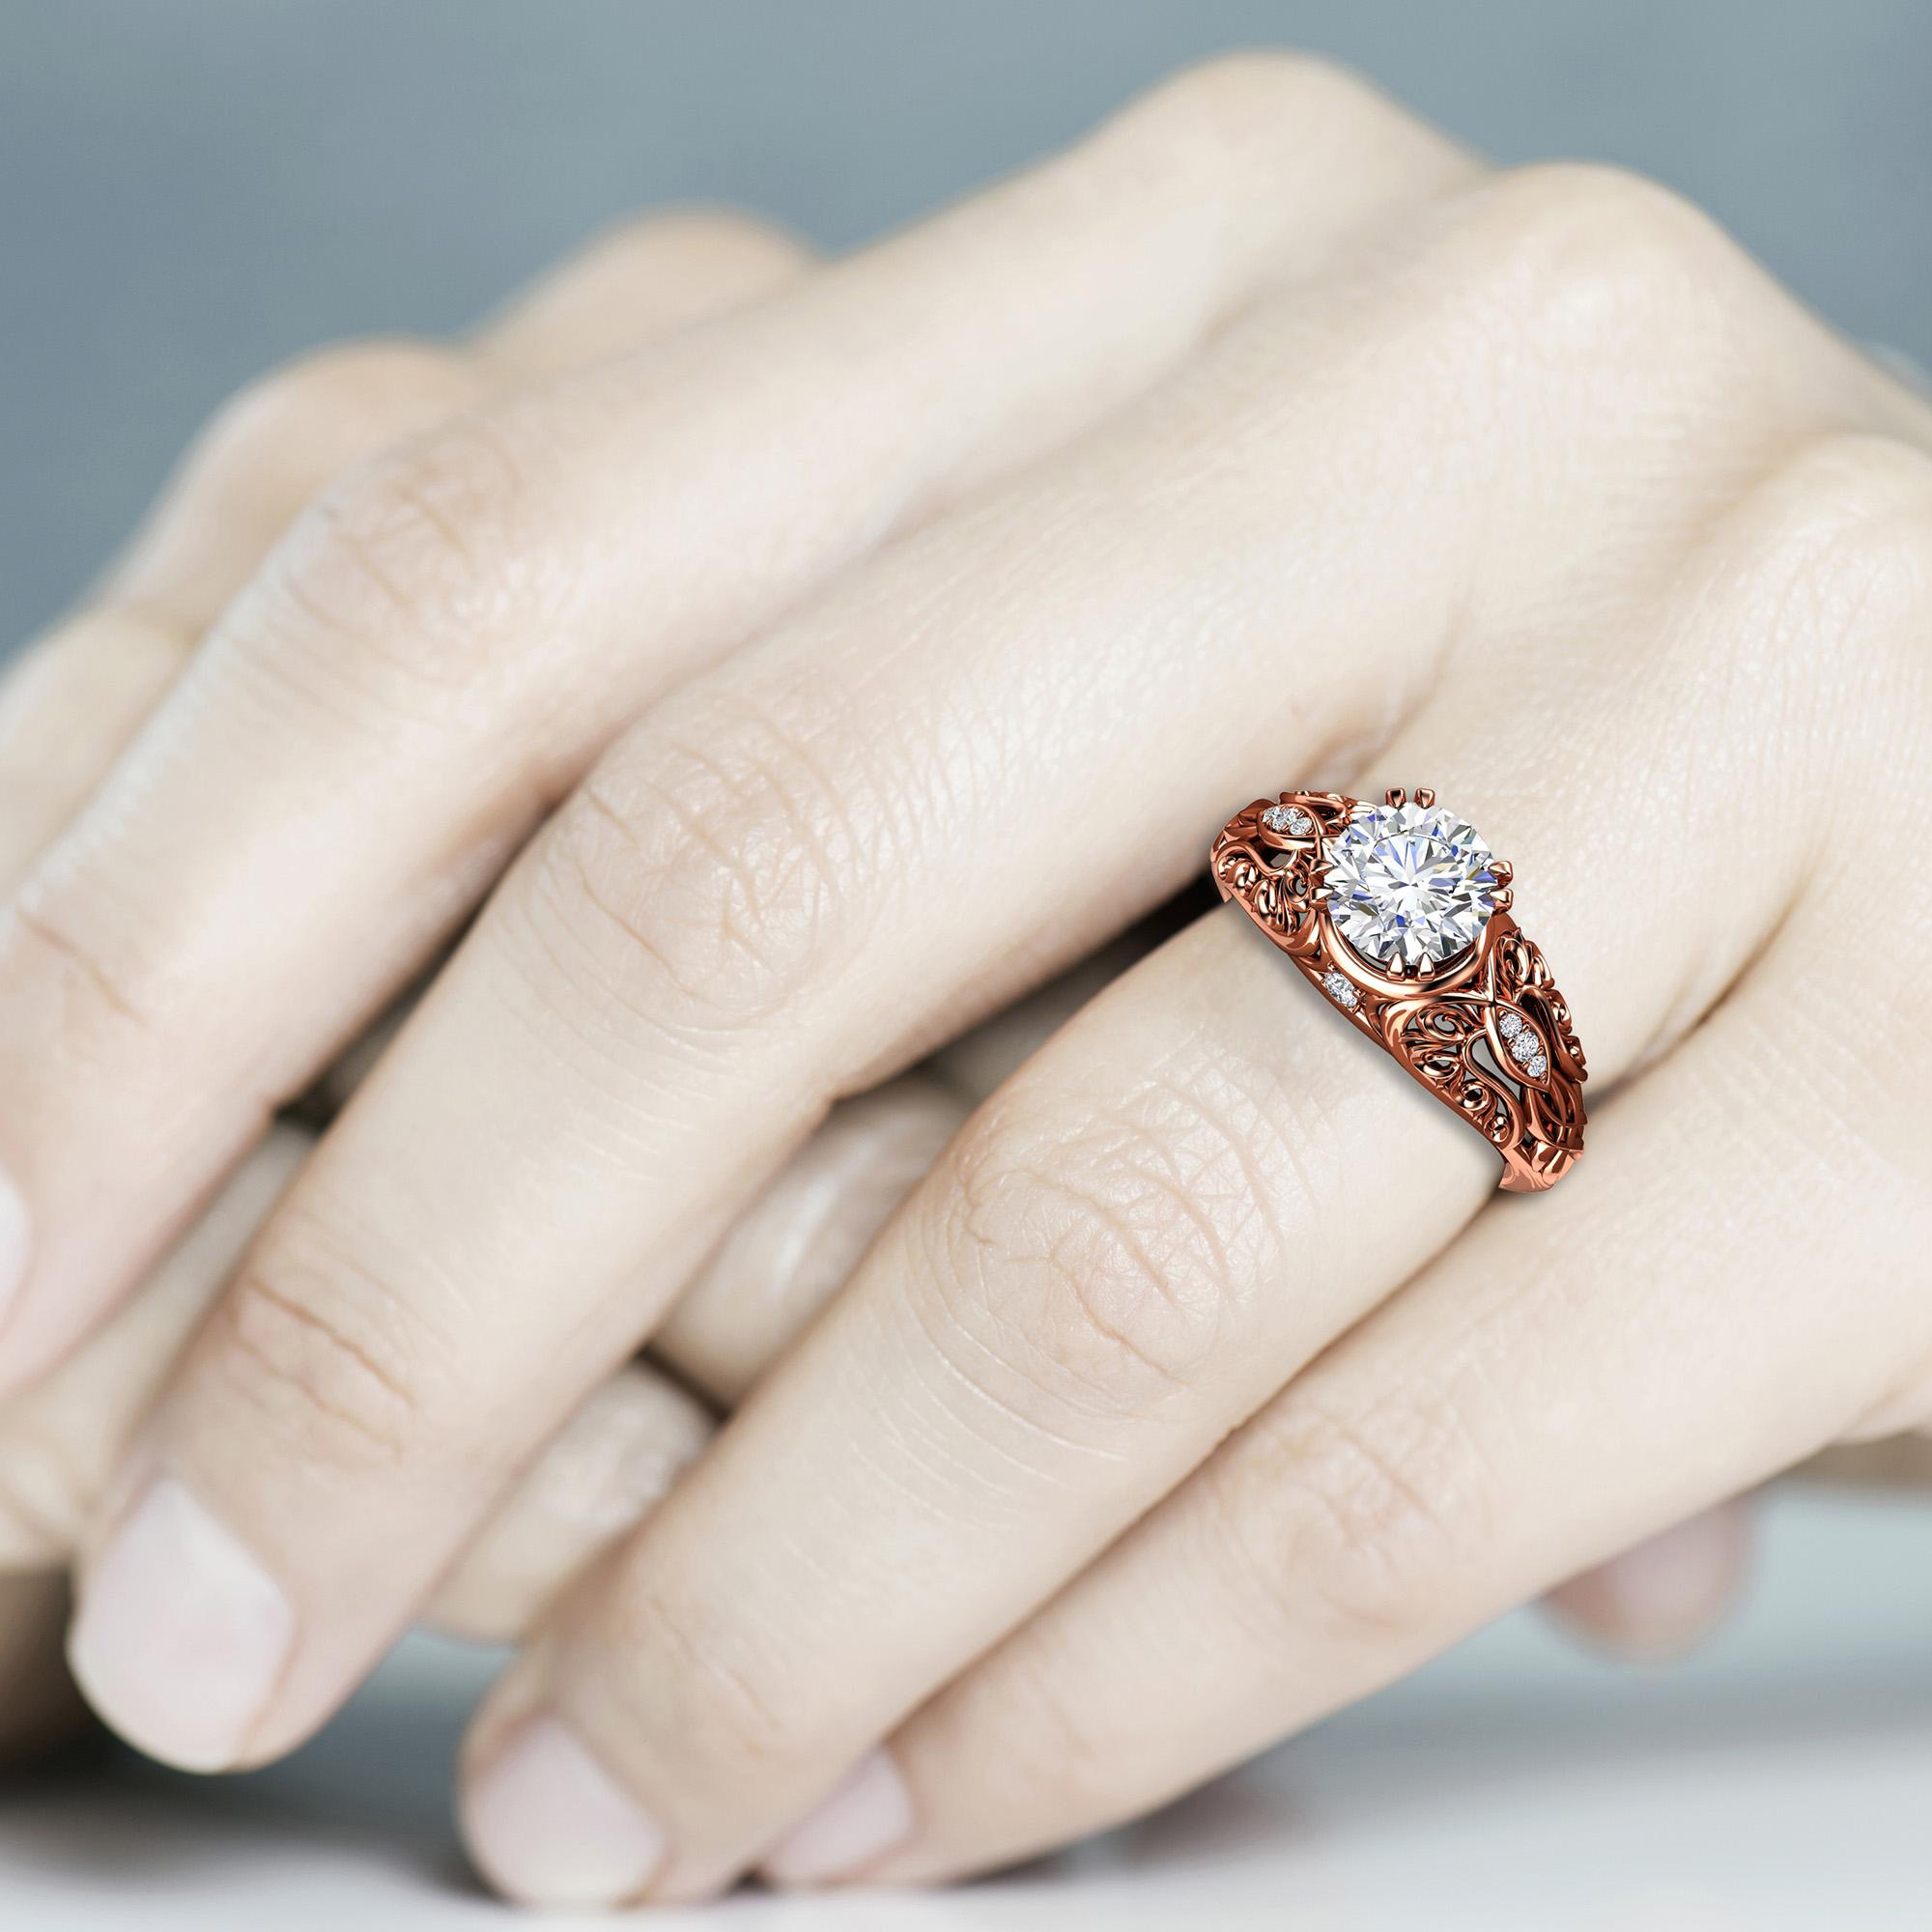 Moissanite Engagement Ring Art Nouveau Styled Ring 14K Rose Gold Ring Diamonds Wedding Ring